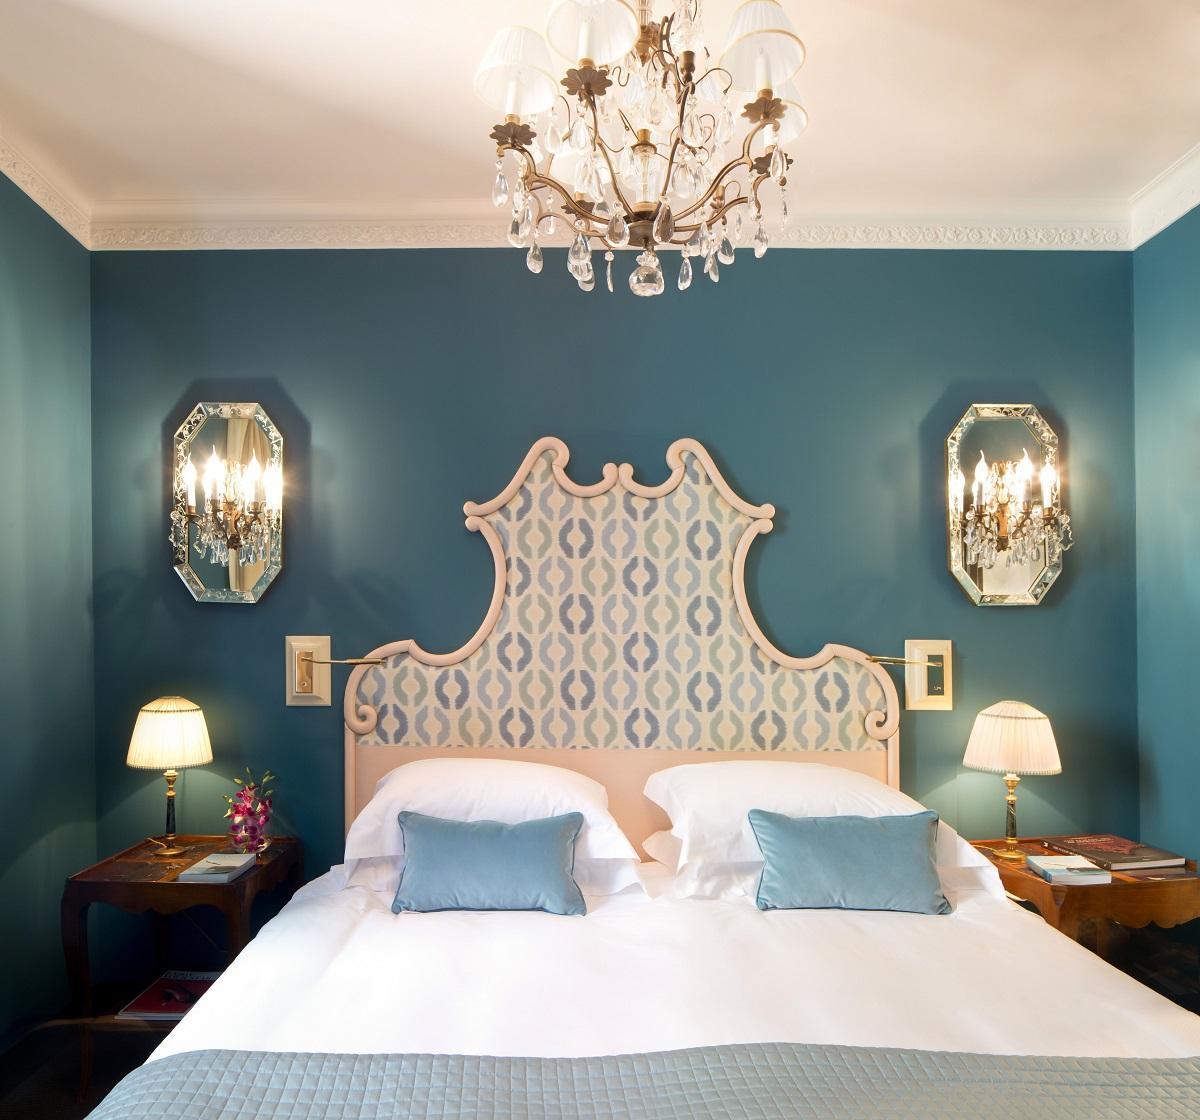 10470_36934_2018-09-18T15-30-00_Starhotels Hotel d'Inghilterra_RM_Superior Room3 (2)